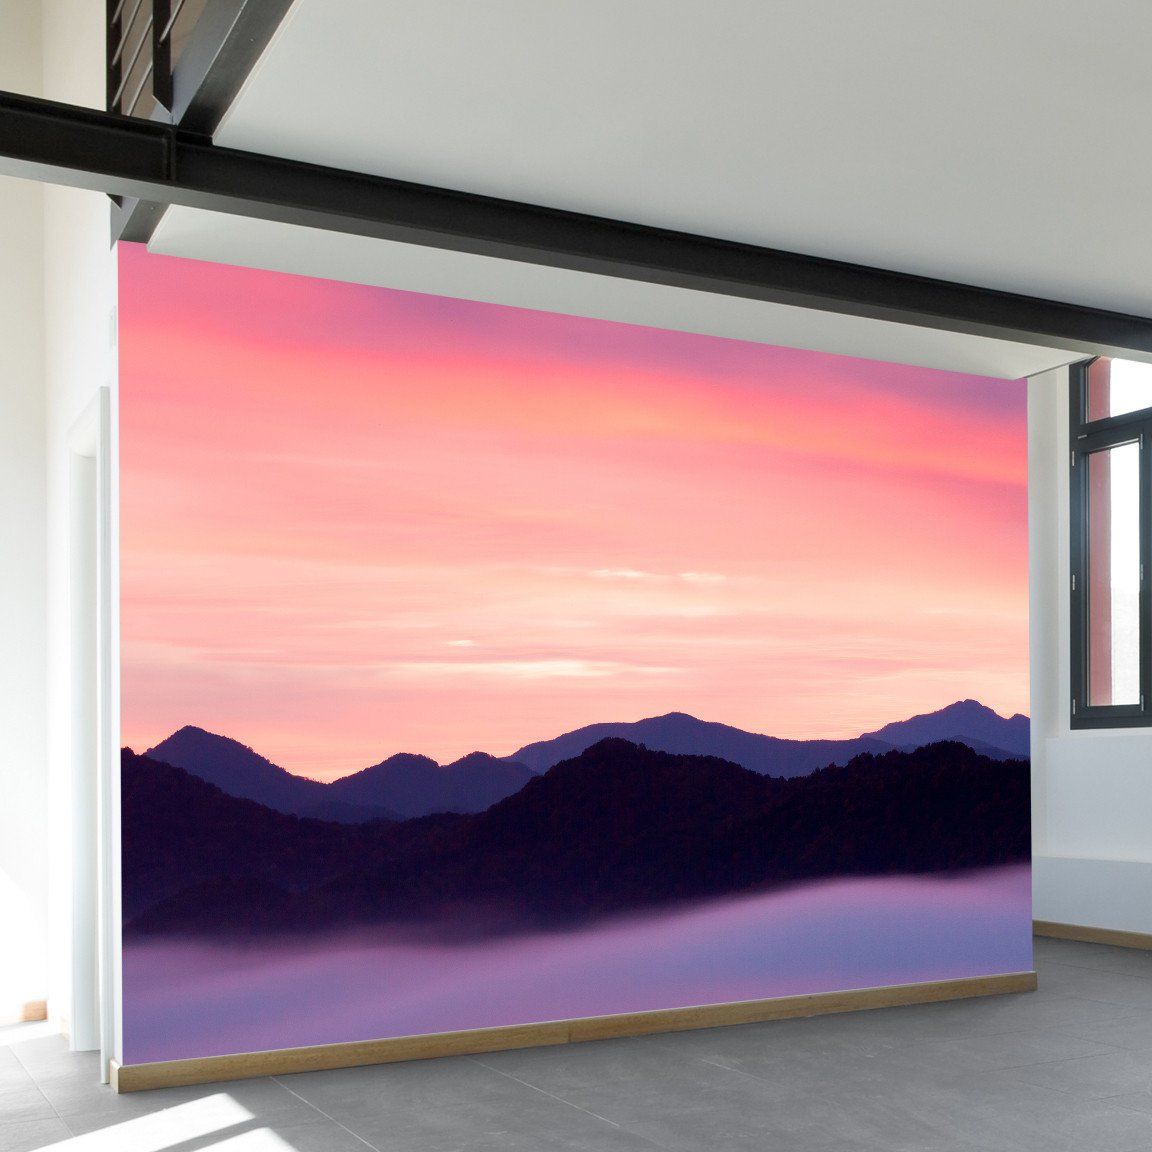 Rocky Mountain Sunset Wall Mural Wallsneedlove Mountain Sunset Painting Canvas Painting Diy Mountain Paintings